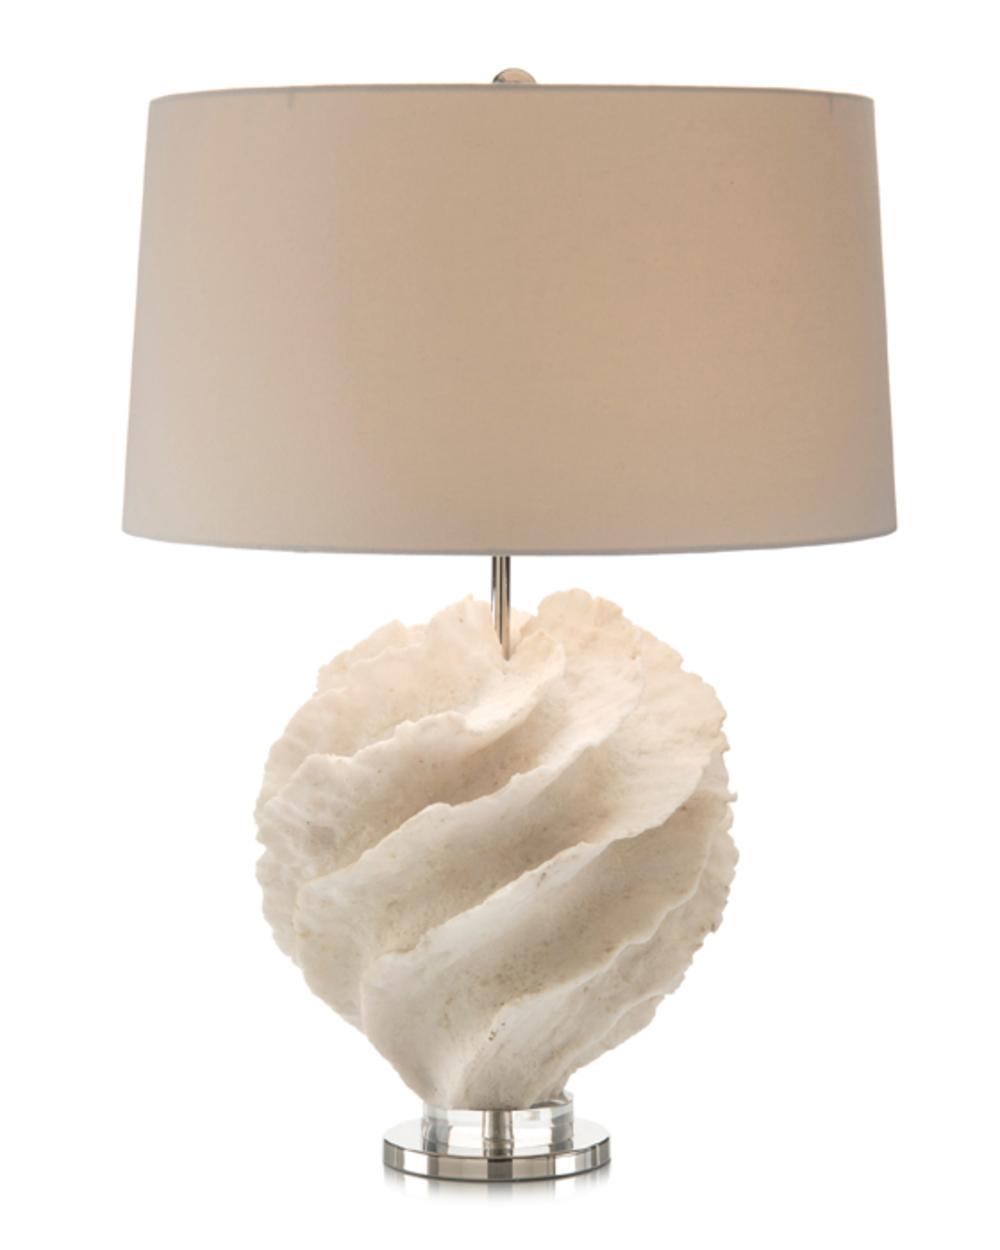 John Richard Collection - Rustic Spiral Table Lamp